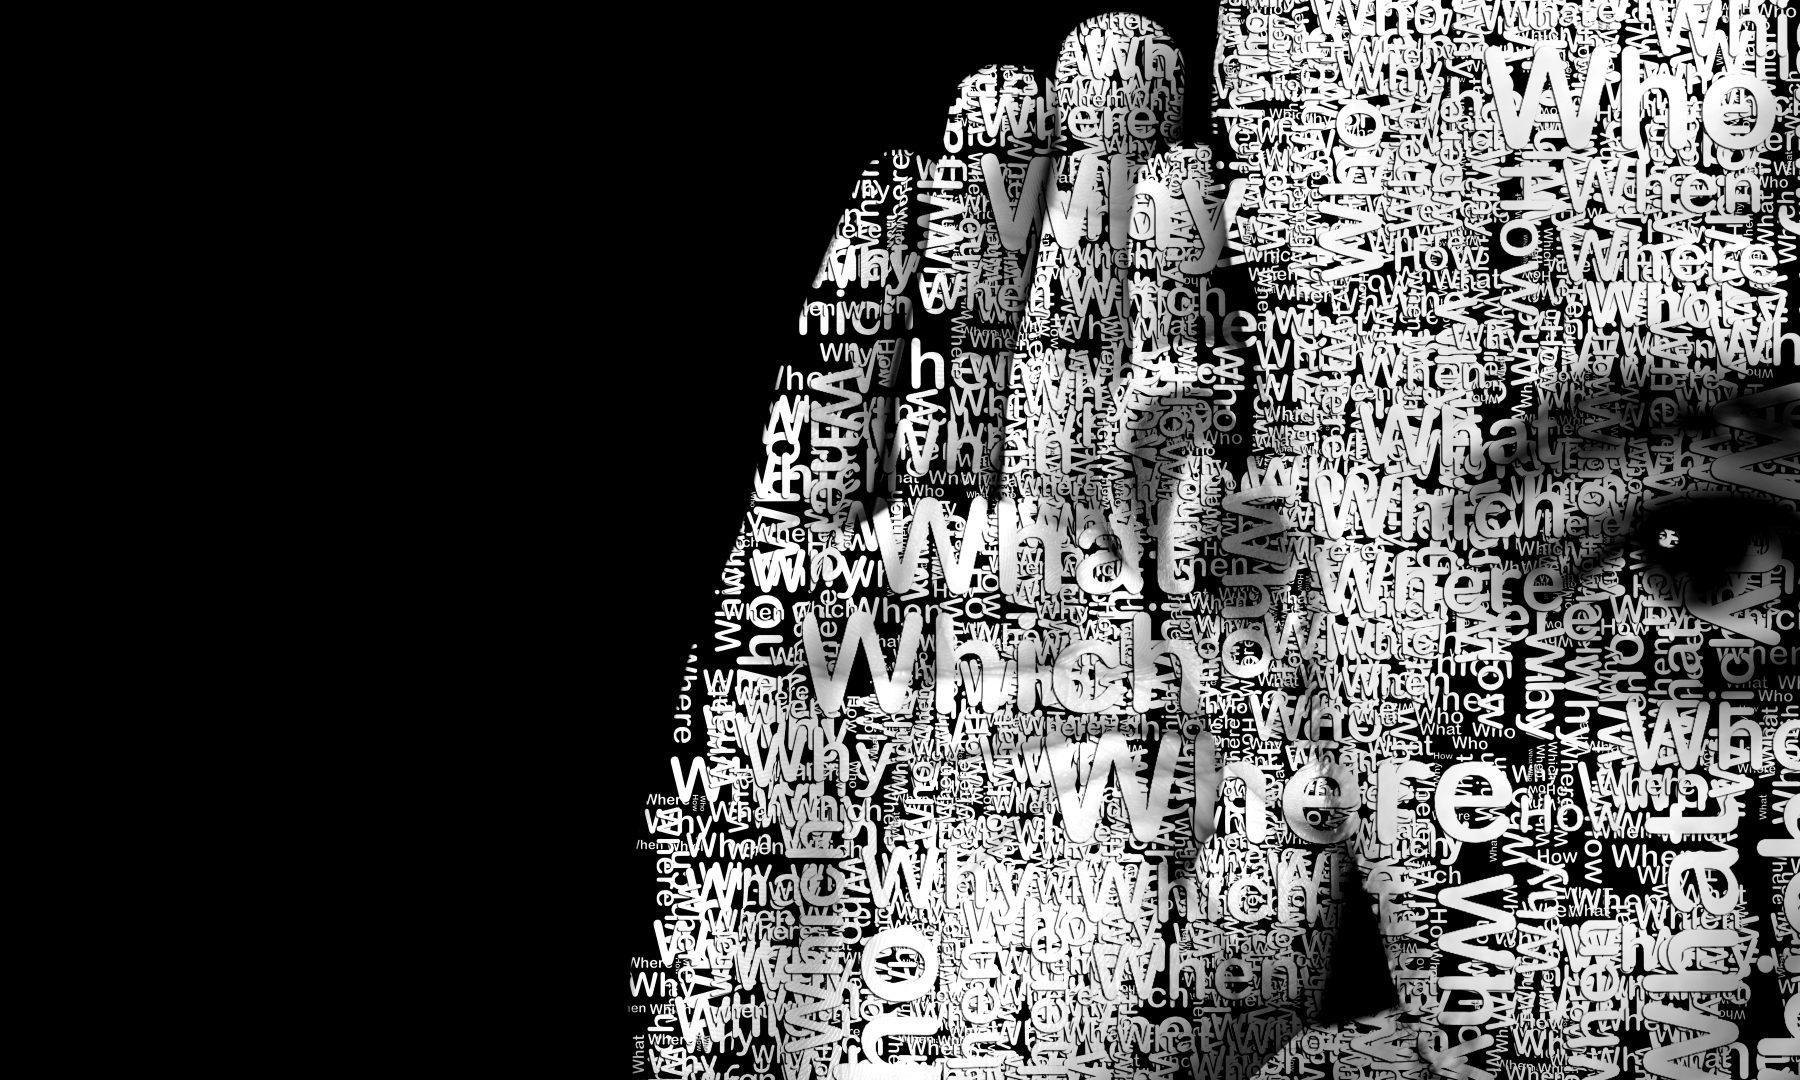 Liquid Voice launches next generation Automated Speech Transcription solution